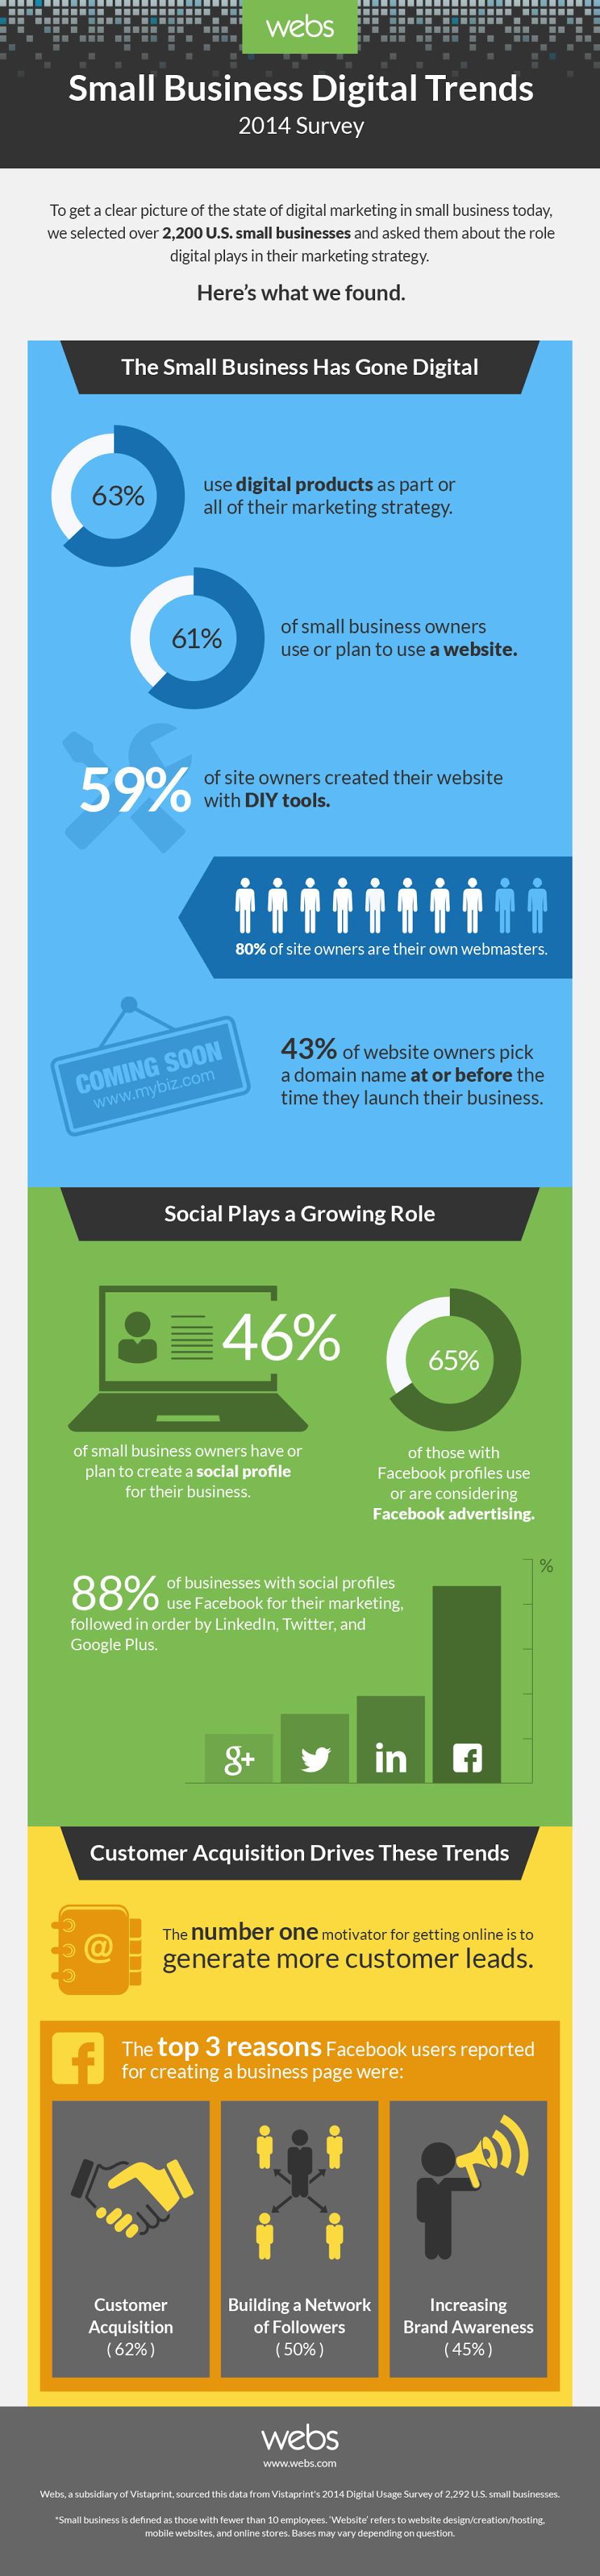 Webs Small Business #DigitalMarketing and #SocialMedia Trends 2014 - #infographic #internetmarketing